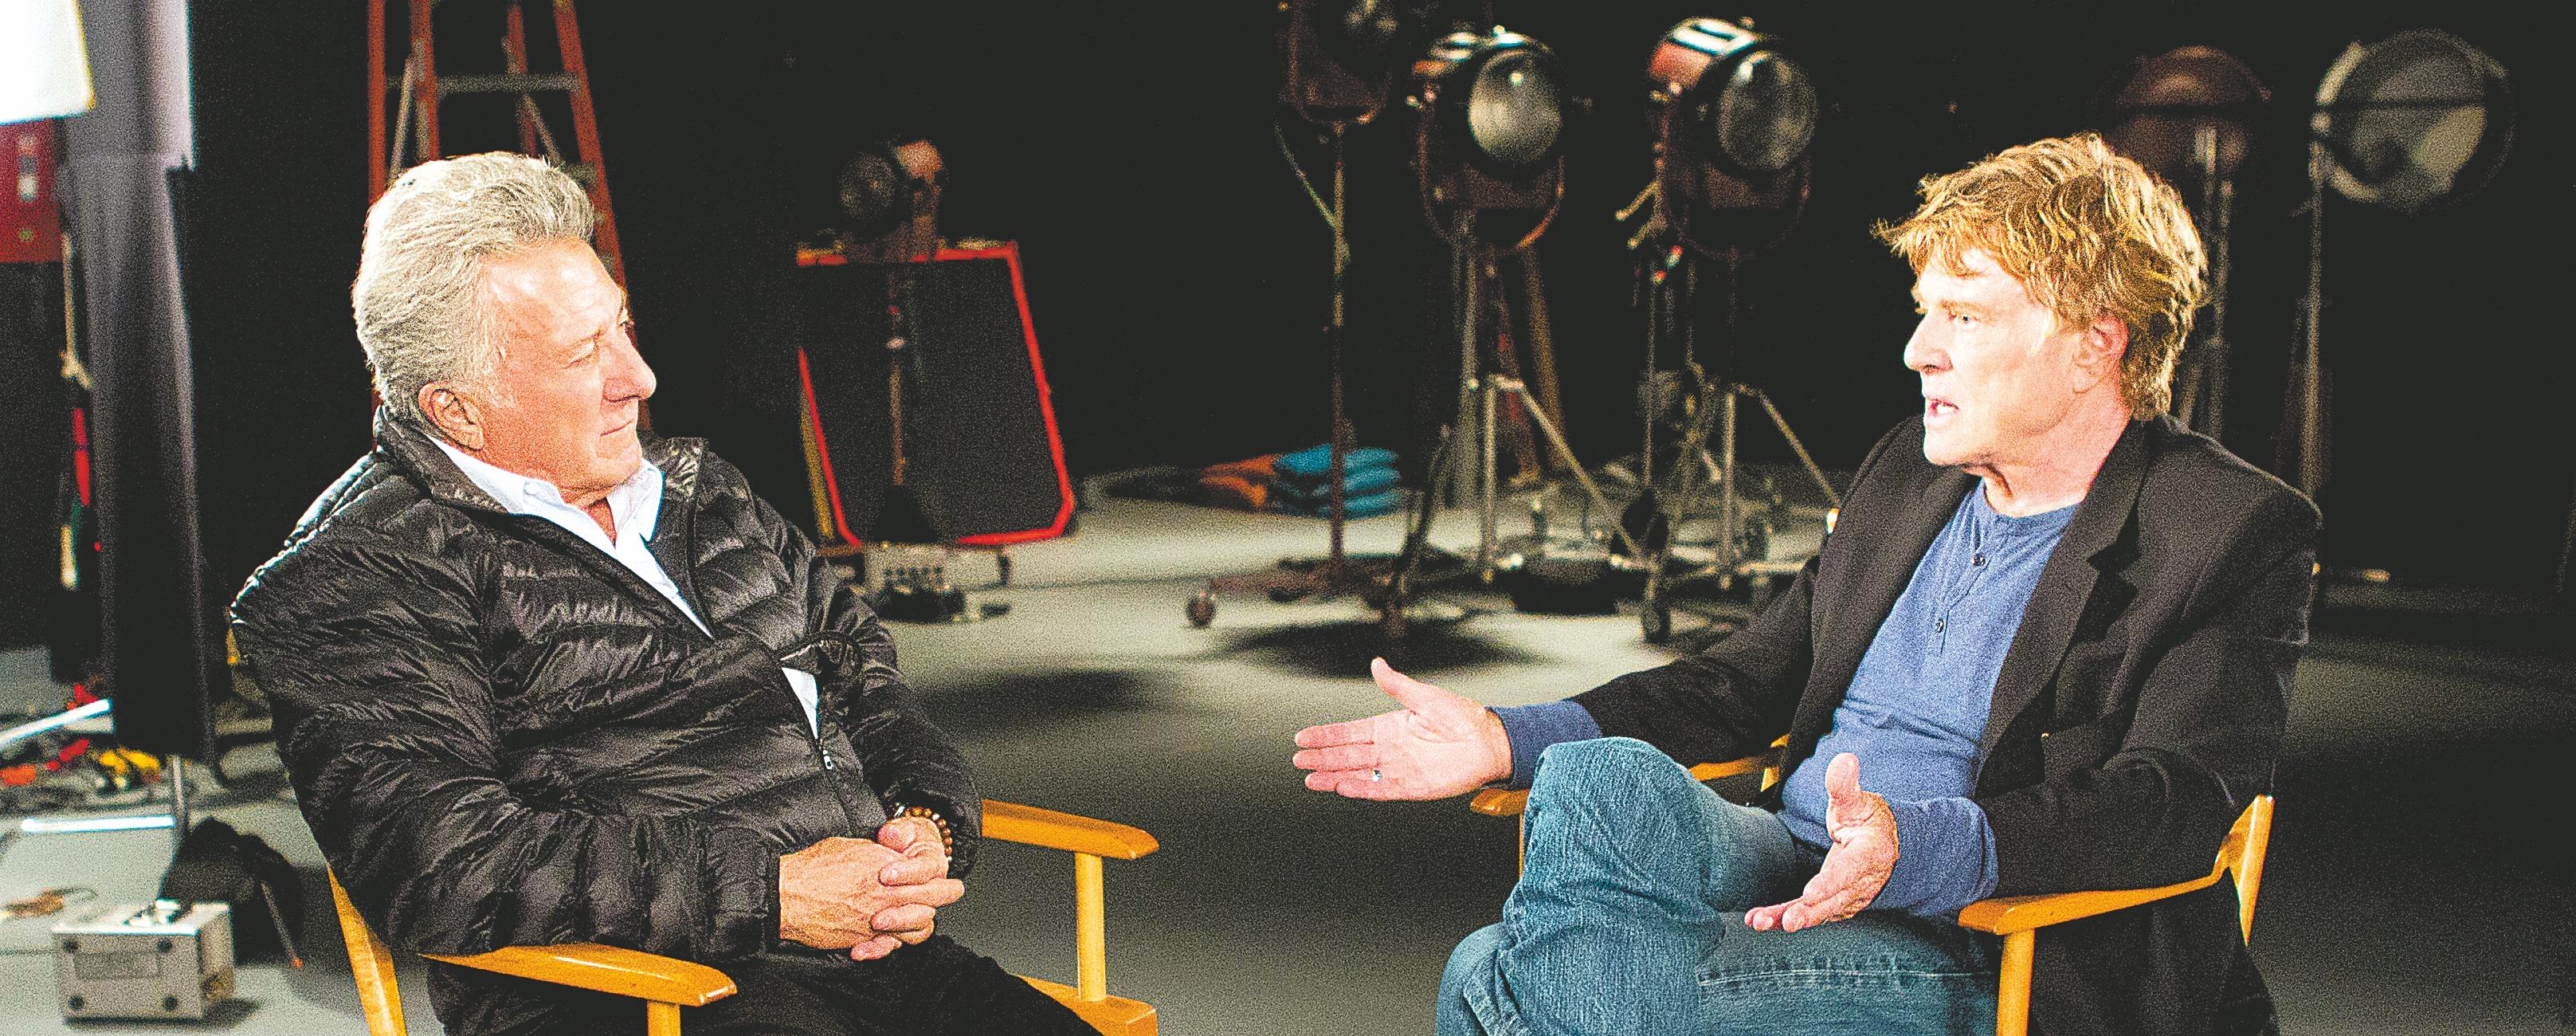 Dustin Hoffman and Robert Redford .